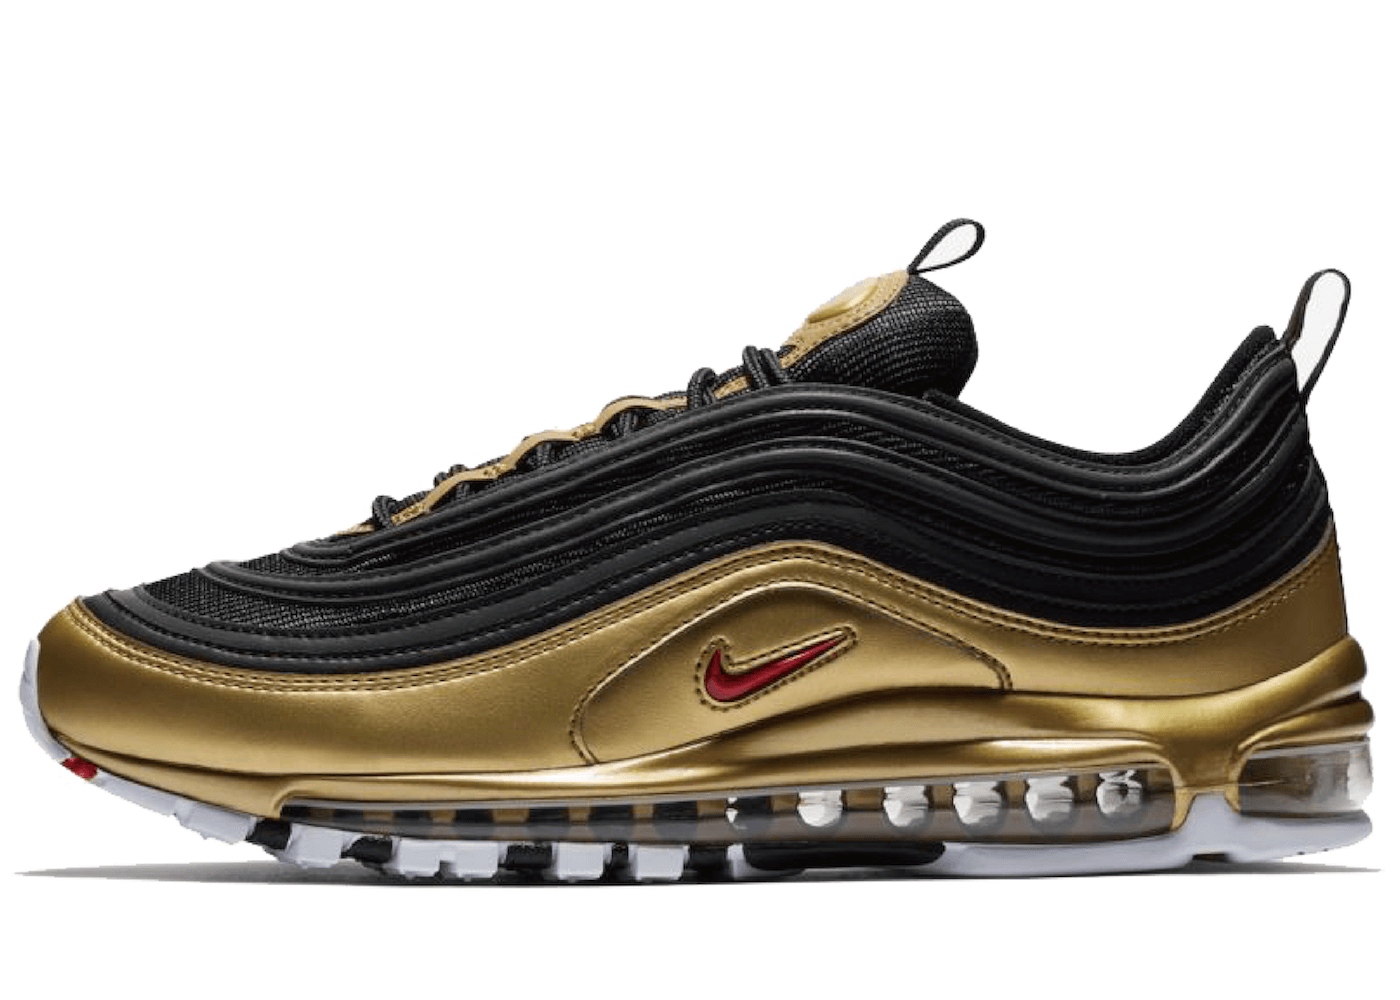 Nike Air Max 97 Black And Metallic Goldの写真